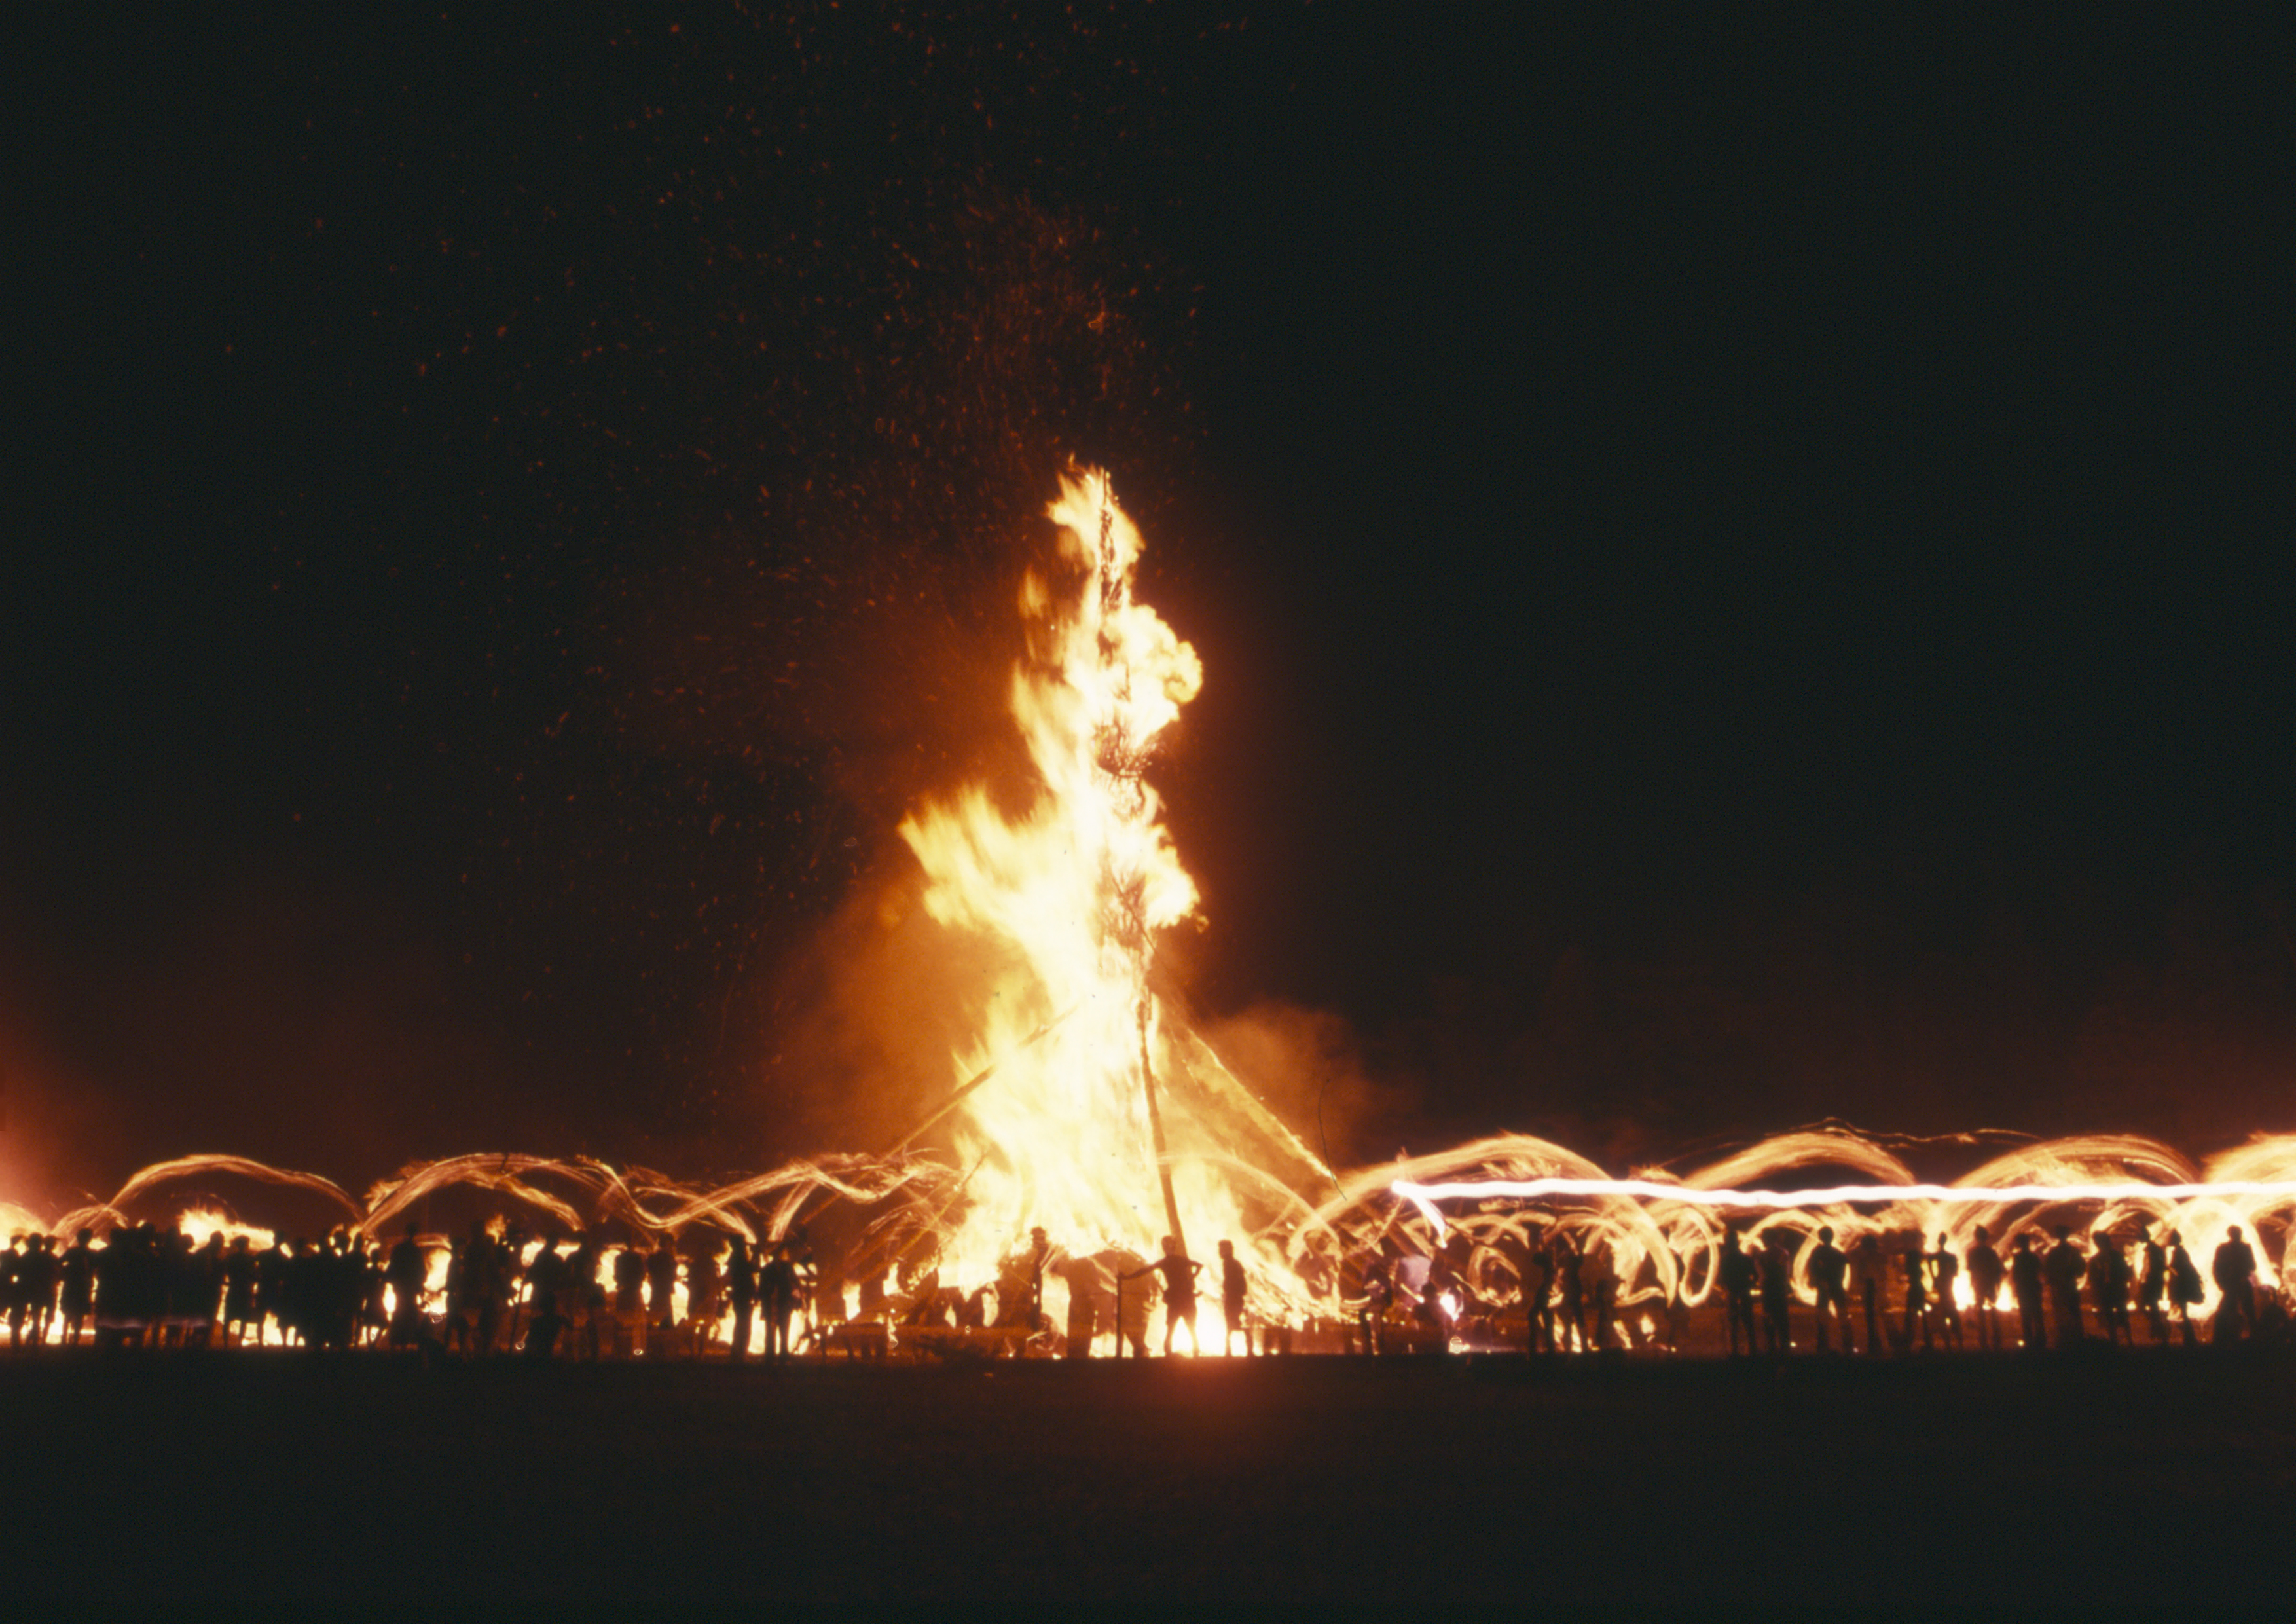 [Noto] Notojima Koda Fire Festival